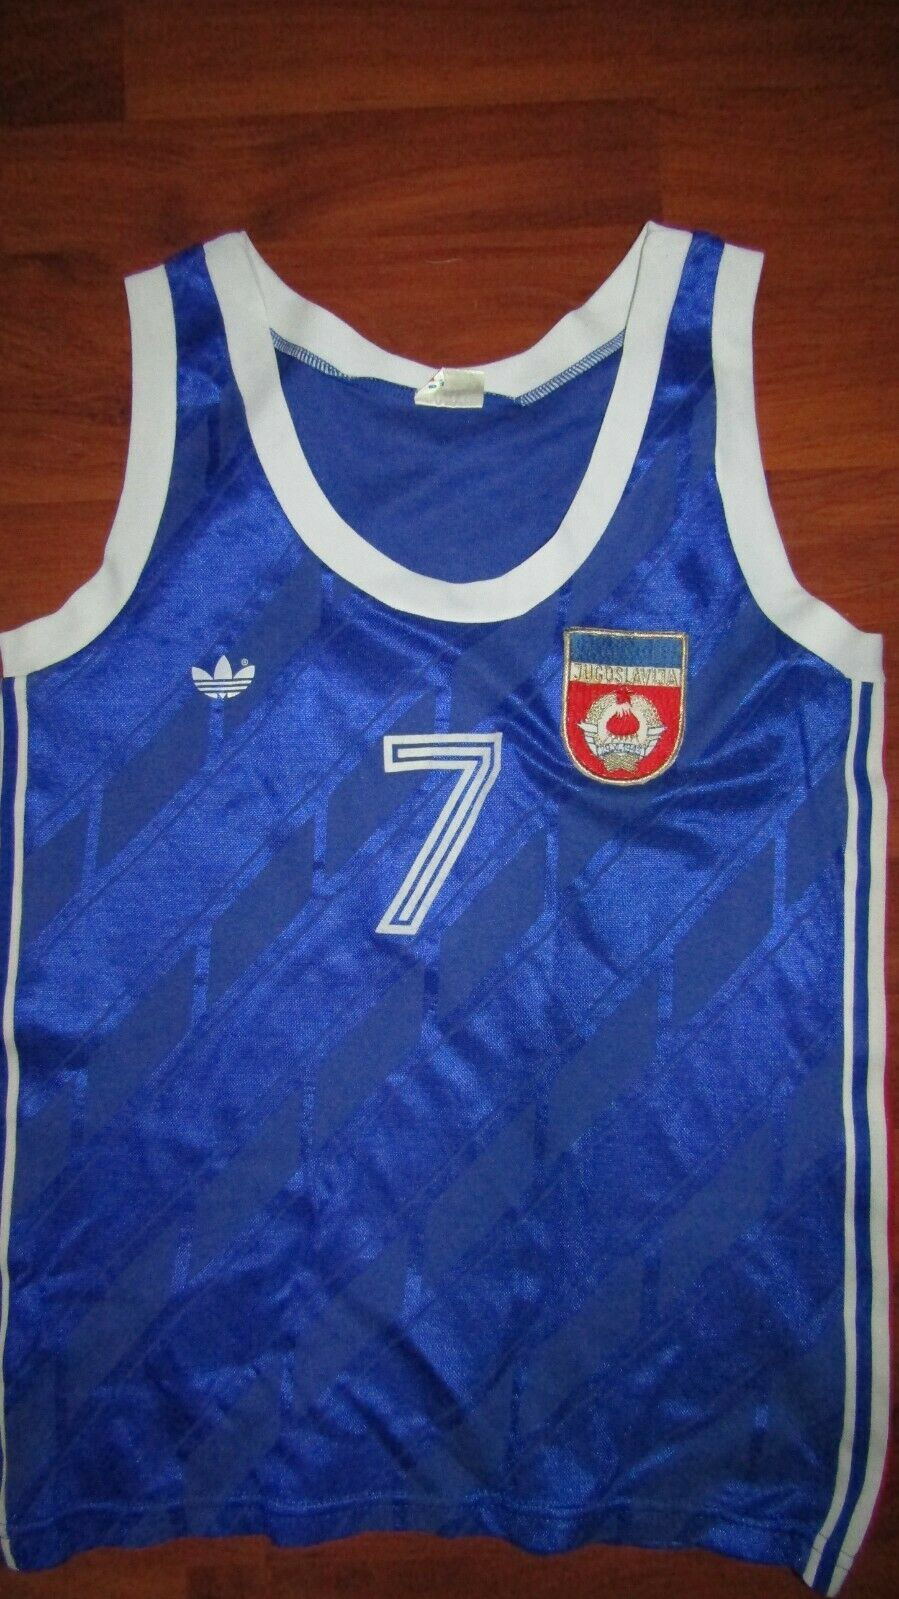 Yugoslavia, Adidas, Match Worn Baloncesto Camiseta, Vintage, 80s-90s, mujeres